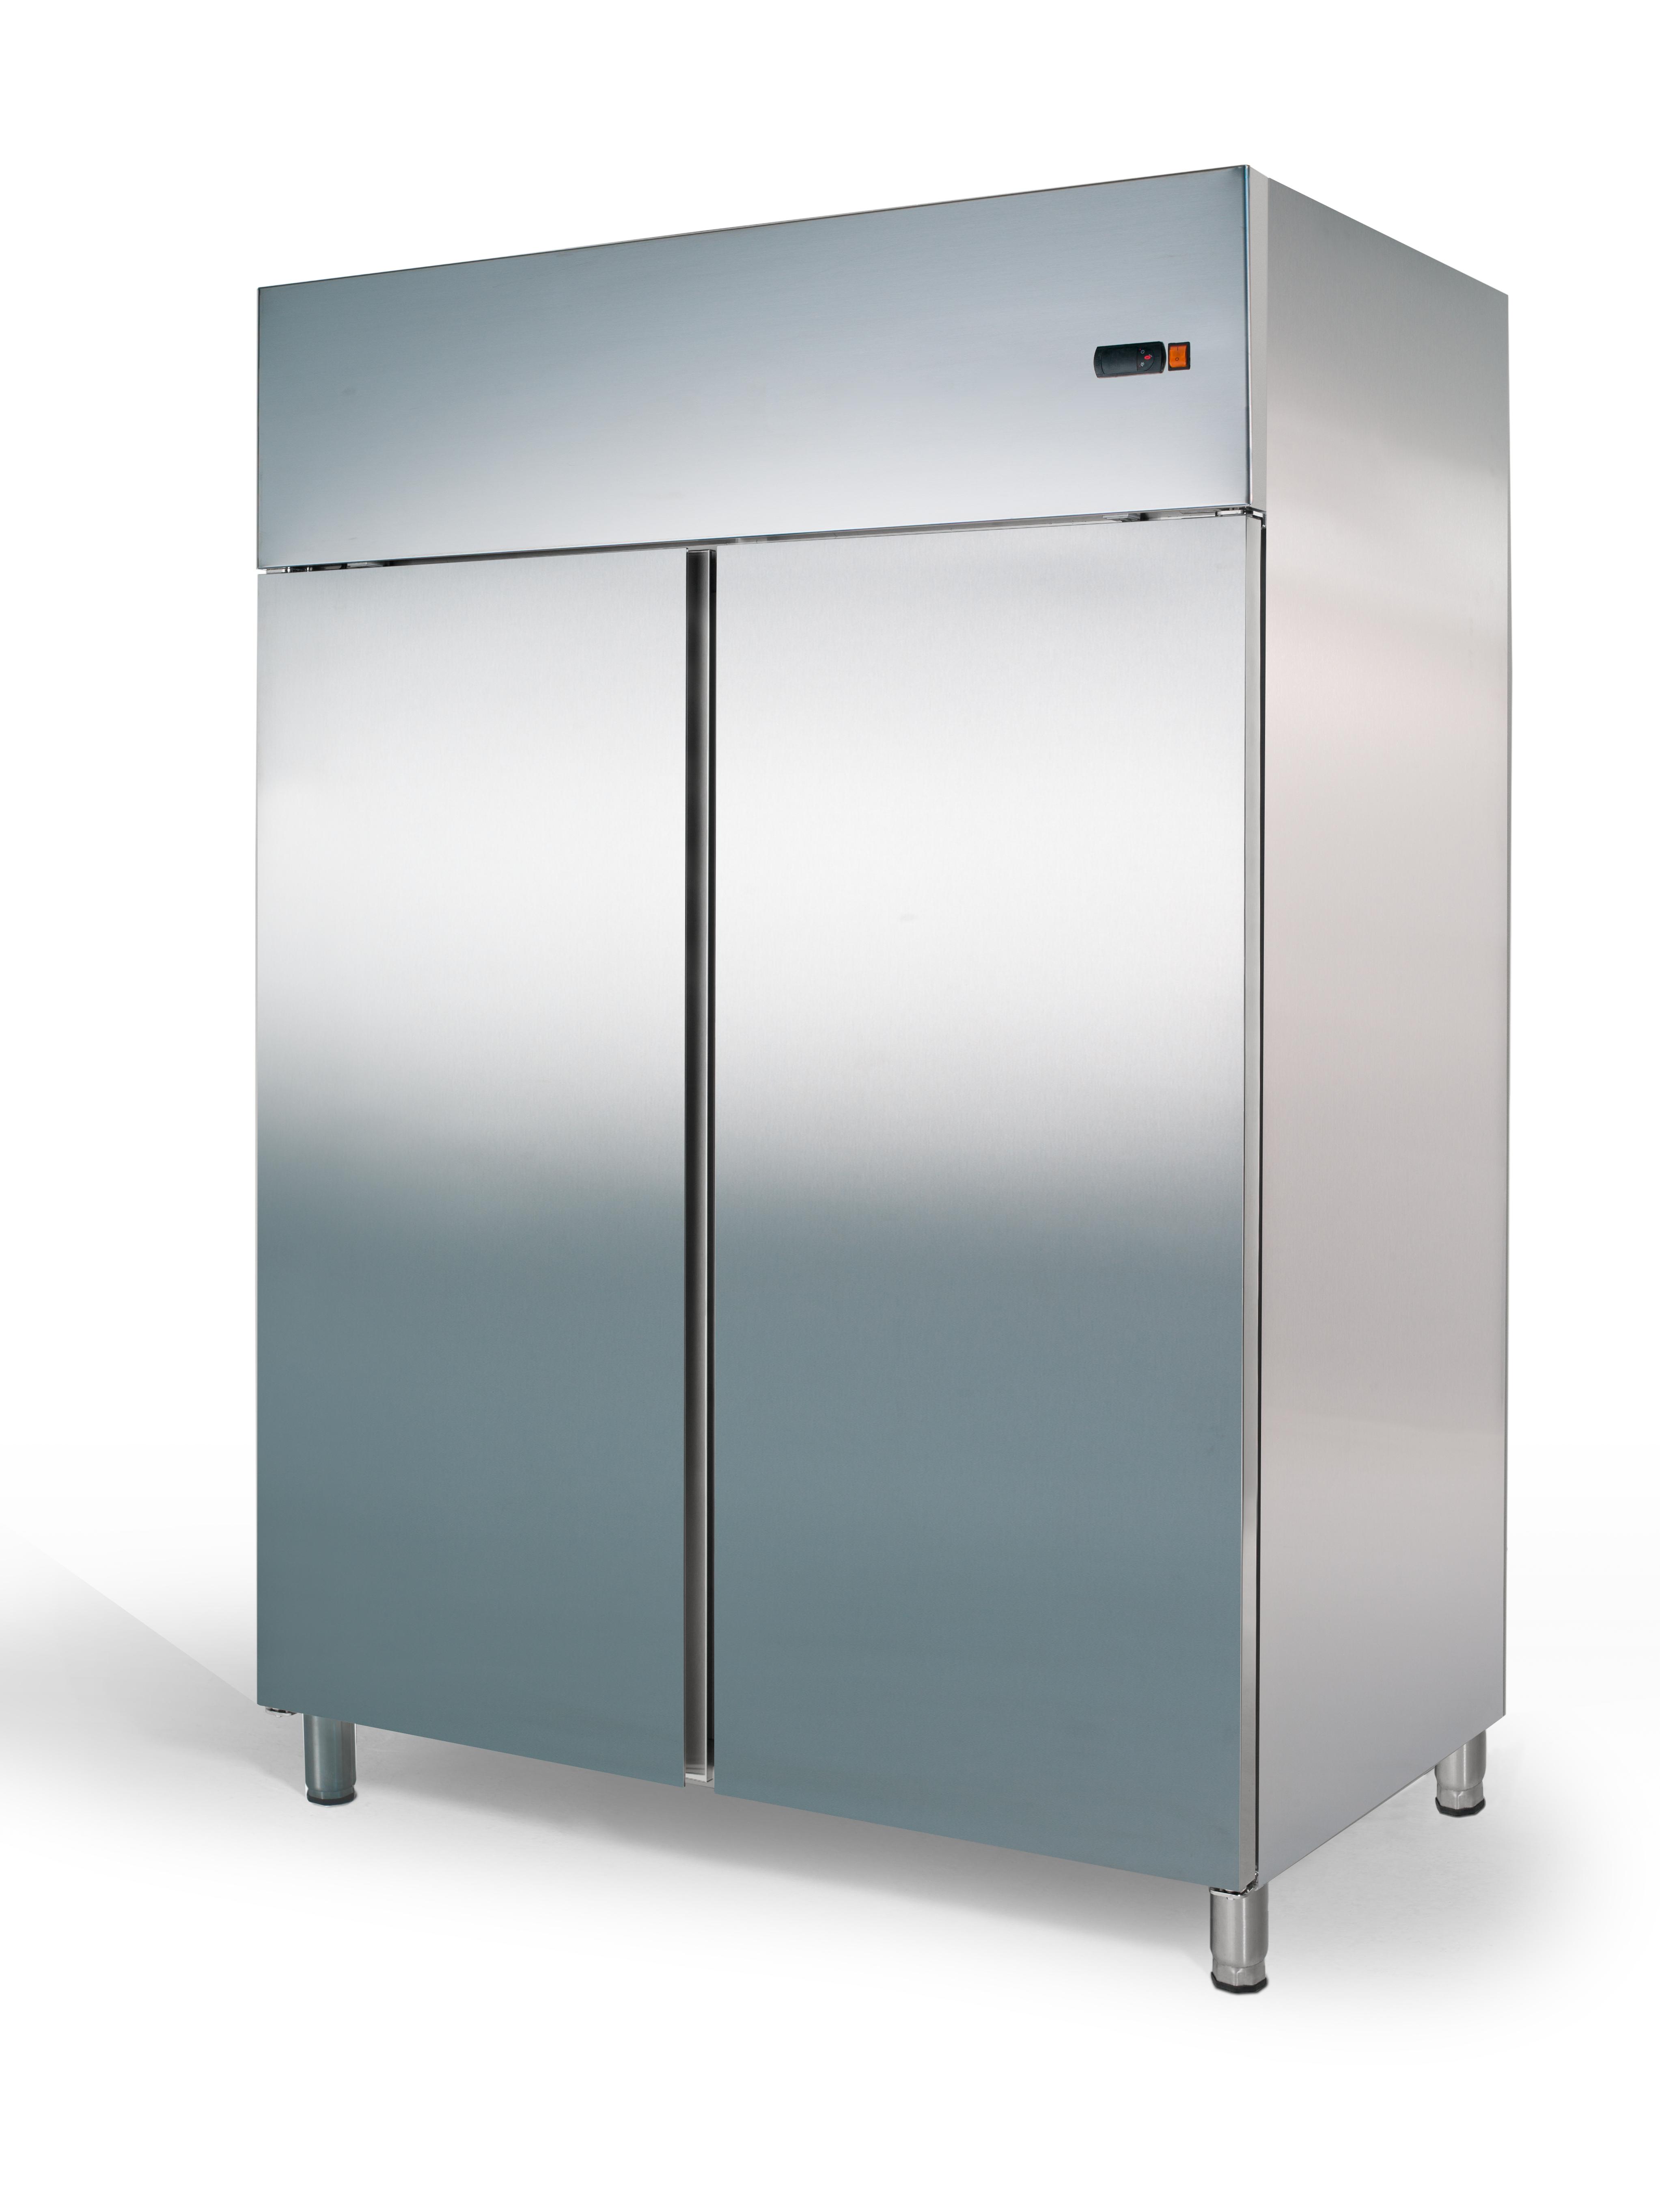 Kühlschrank Profi 1400 GN 2/1 - mit 2 Türen Online-Shop GASTRO-HERO